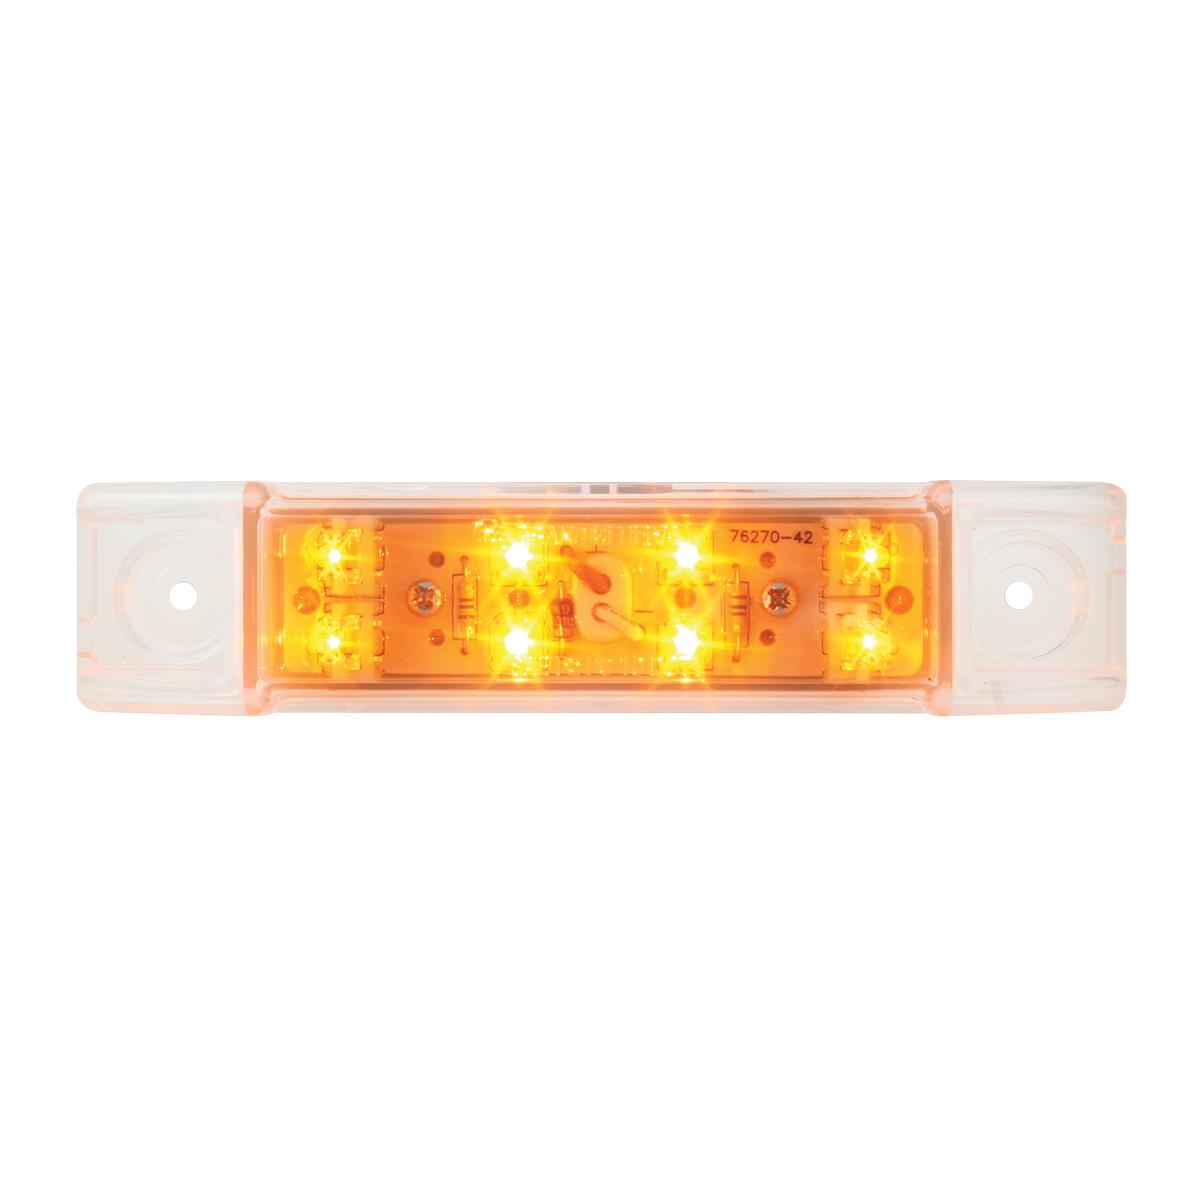 75171 Rectangular Wide Angle Dual Function LED Light